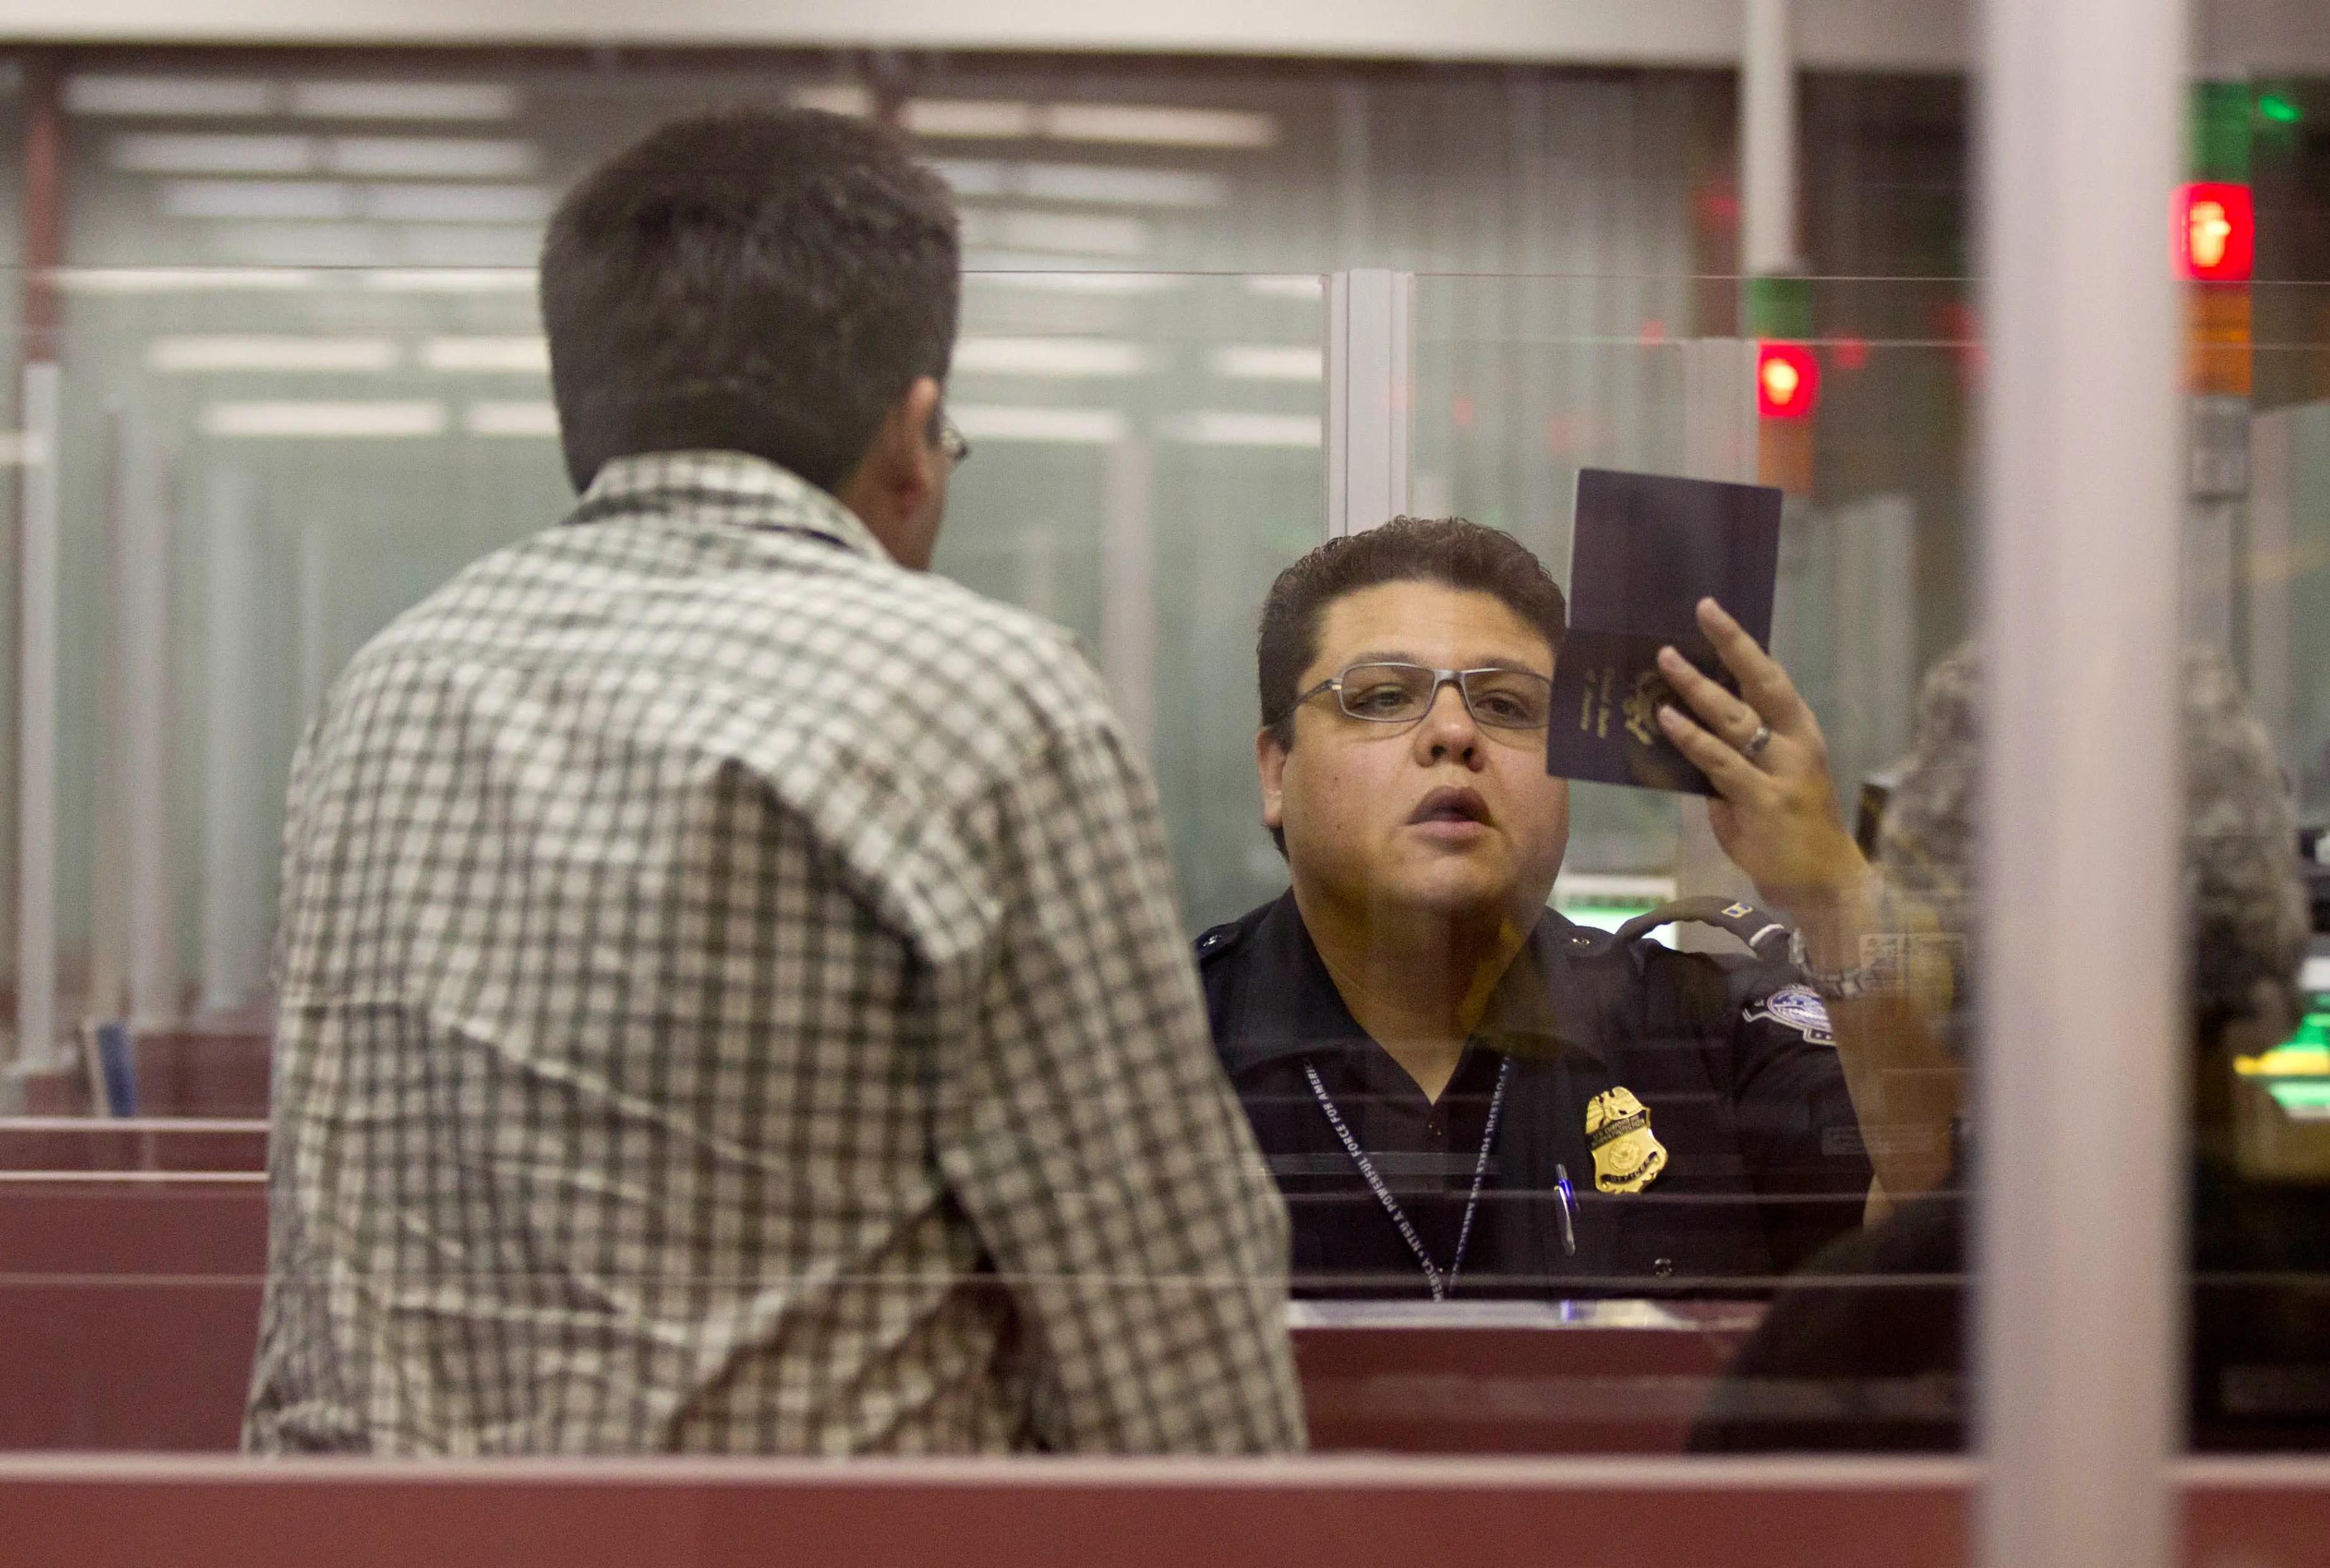 customs passport border airport